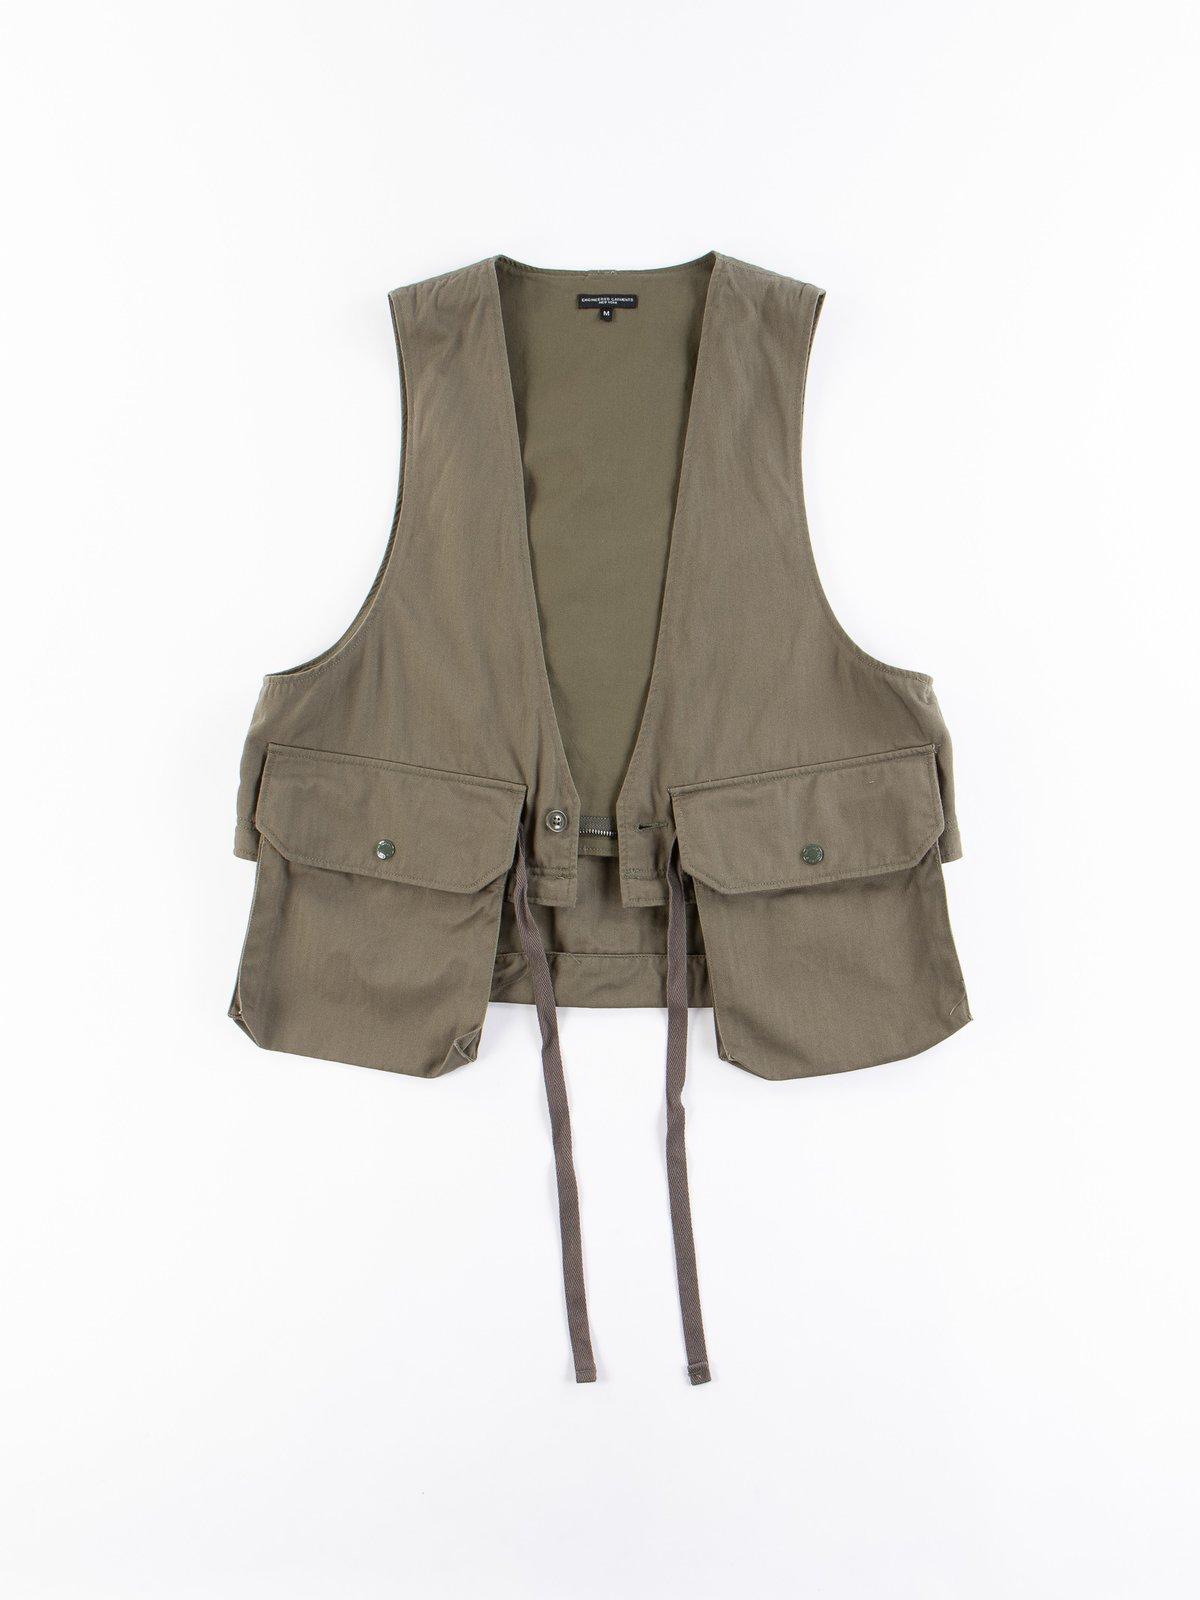 Olive Cotton Herringbone Twill Long Fowl Vest - Image 9